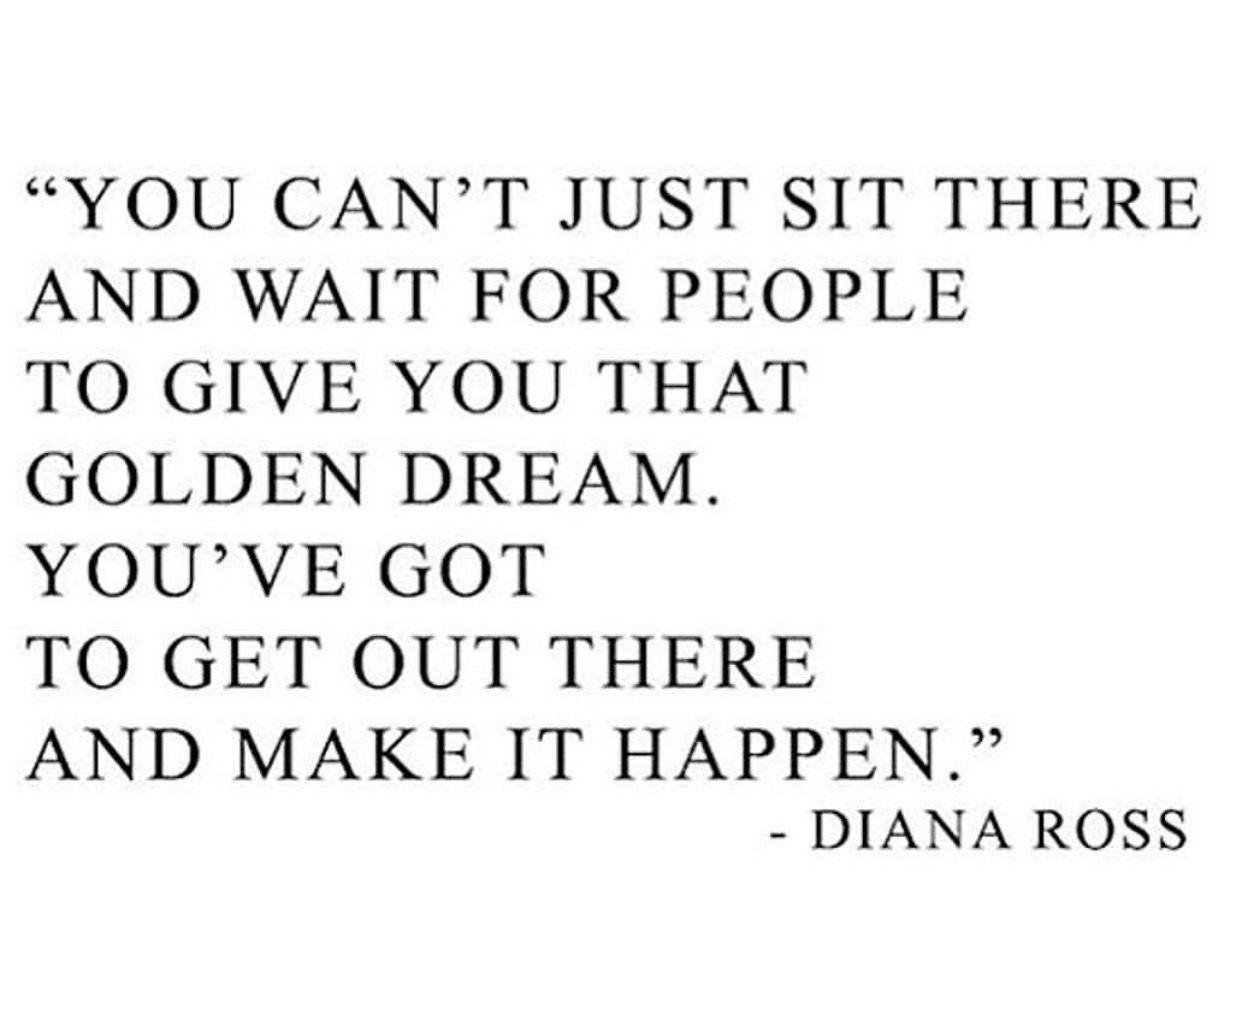 Make it happen ~ Diana Ross